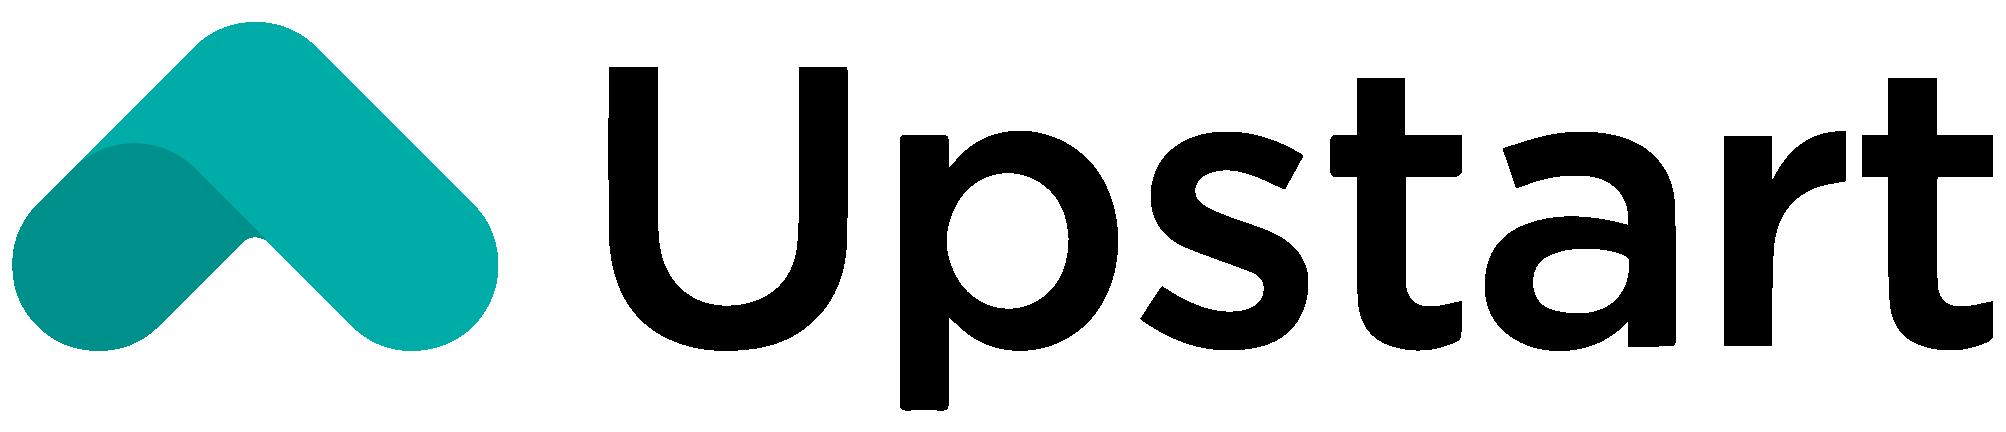 UPST logo